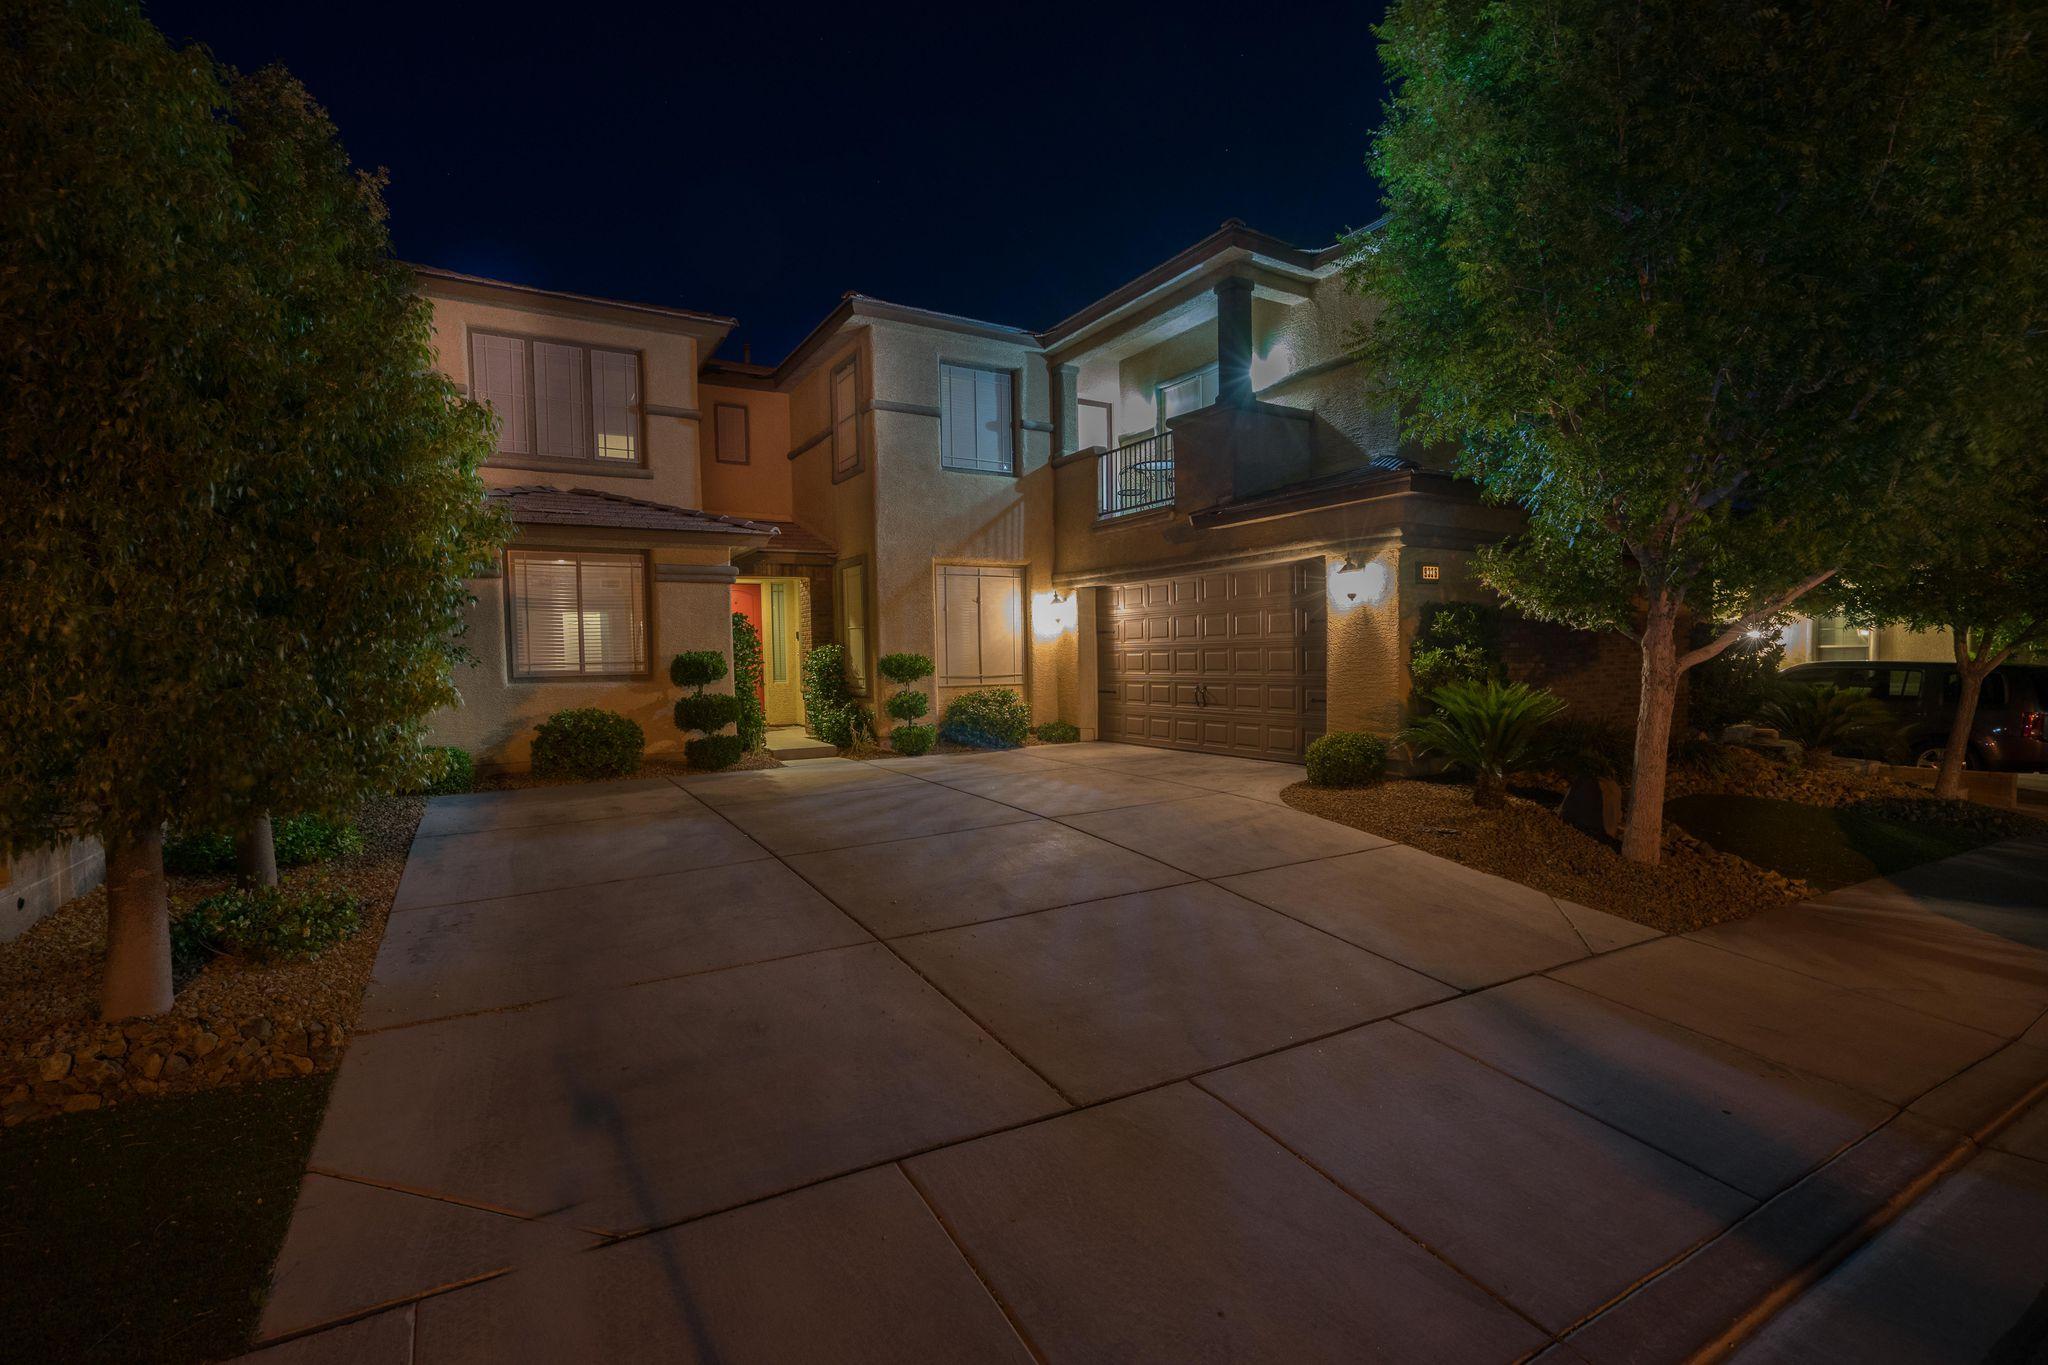 9336 brownstone ledge ave las vegas nv recently sold